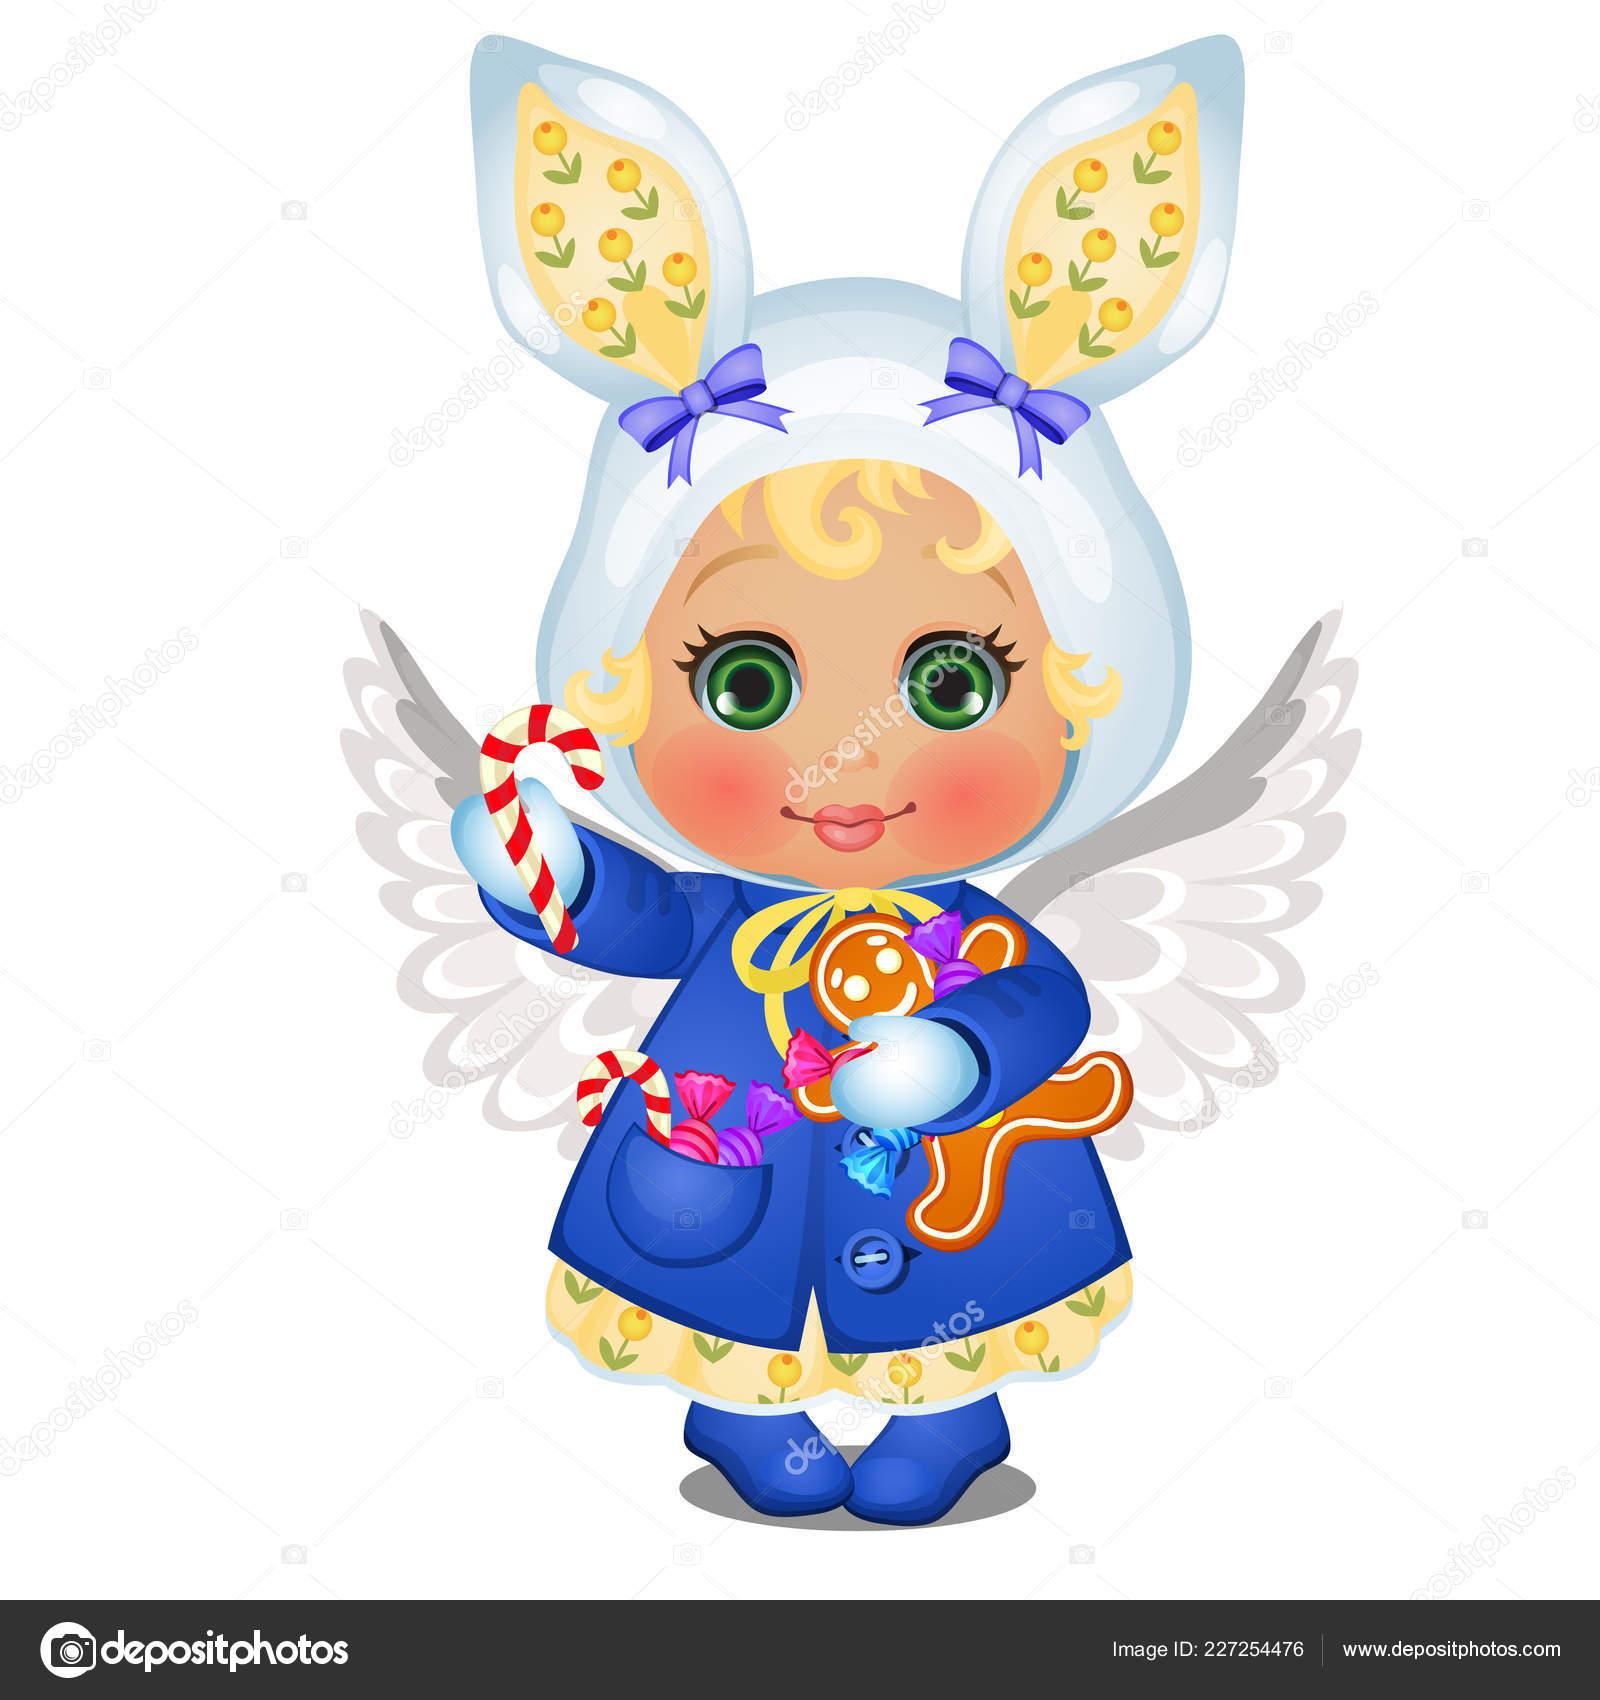 c1f4e992ad13 Κινουμένων σχεδίων χαριτωμένο μικρό κορίτσι σε ρούχα του χειμώνα με ...